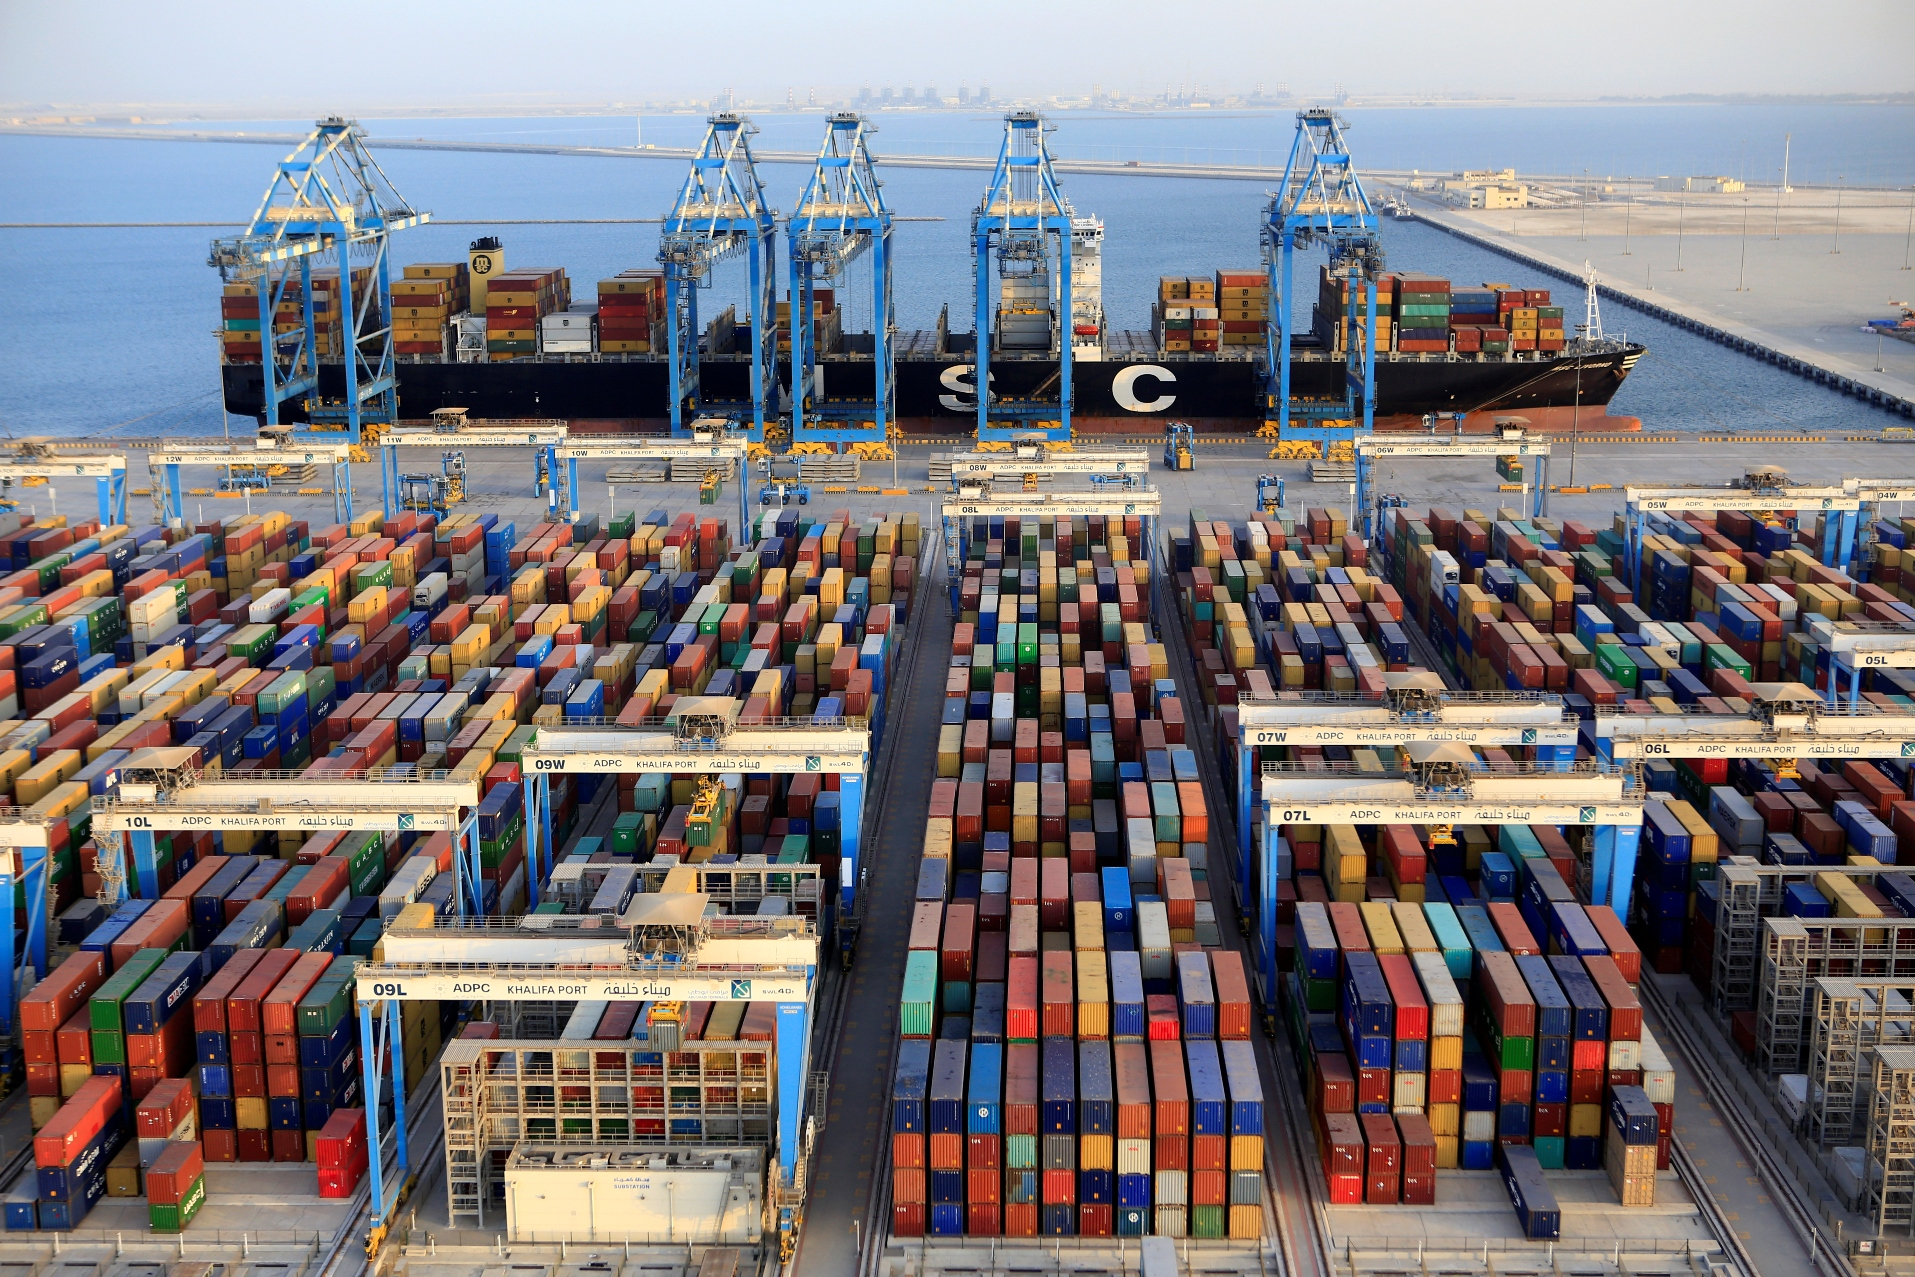 Container port photo